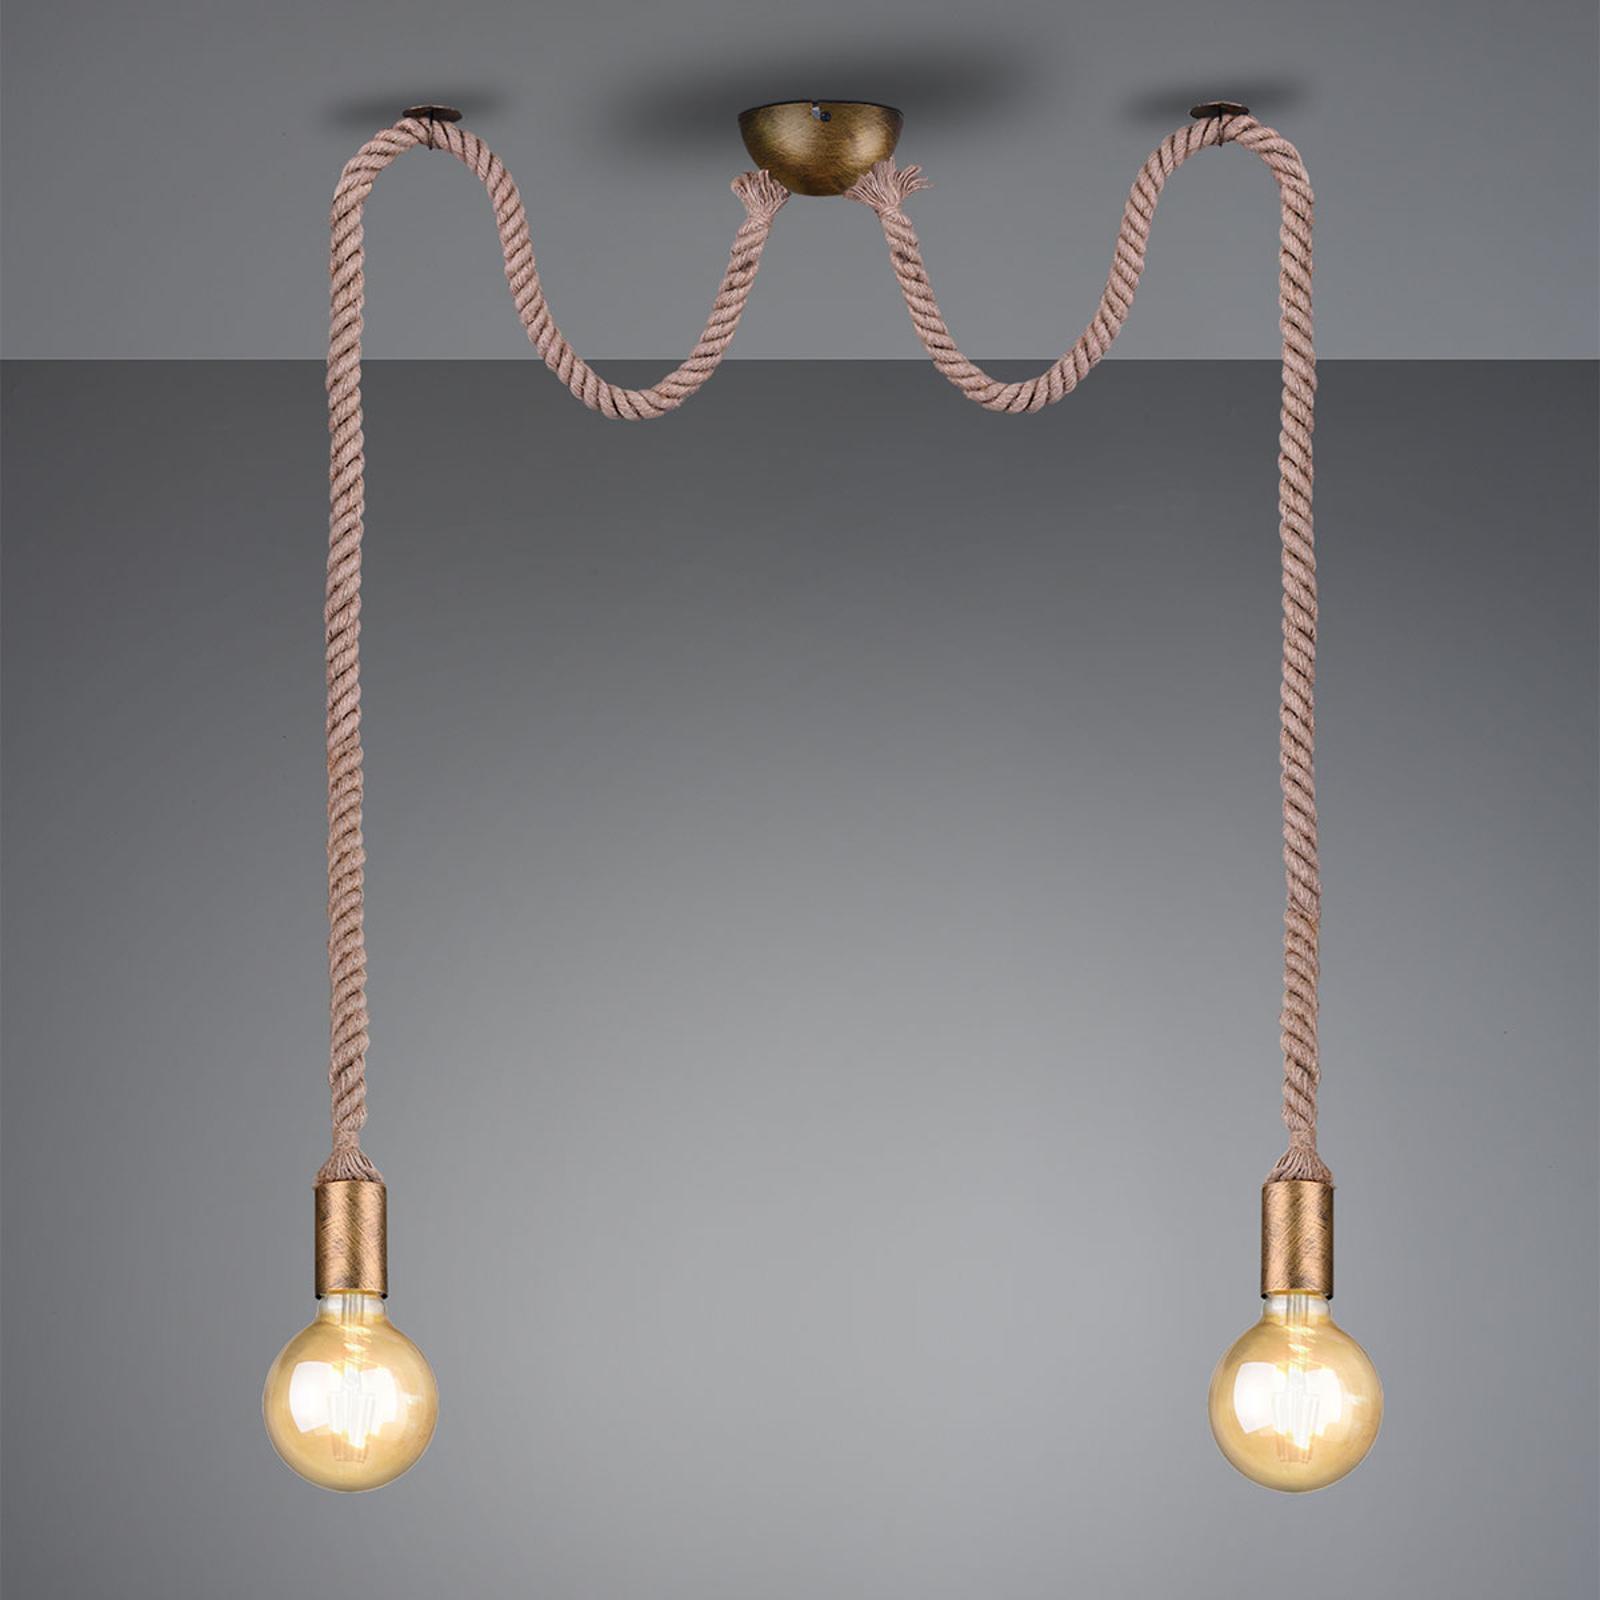 Pendellampa Rope med dekorativt rep 2 lampor